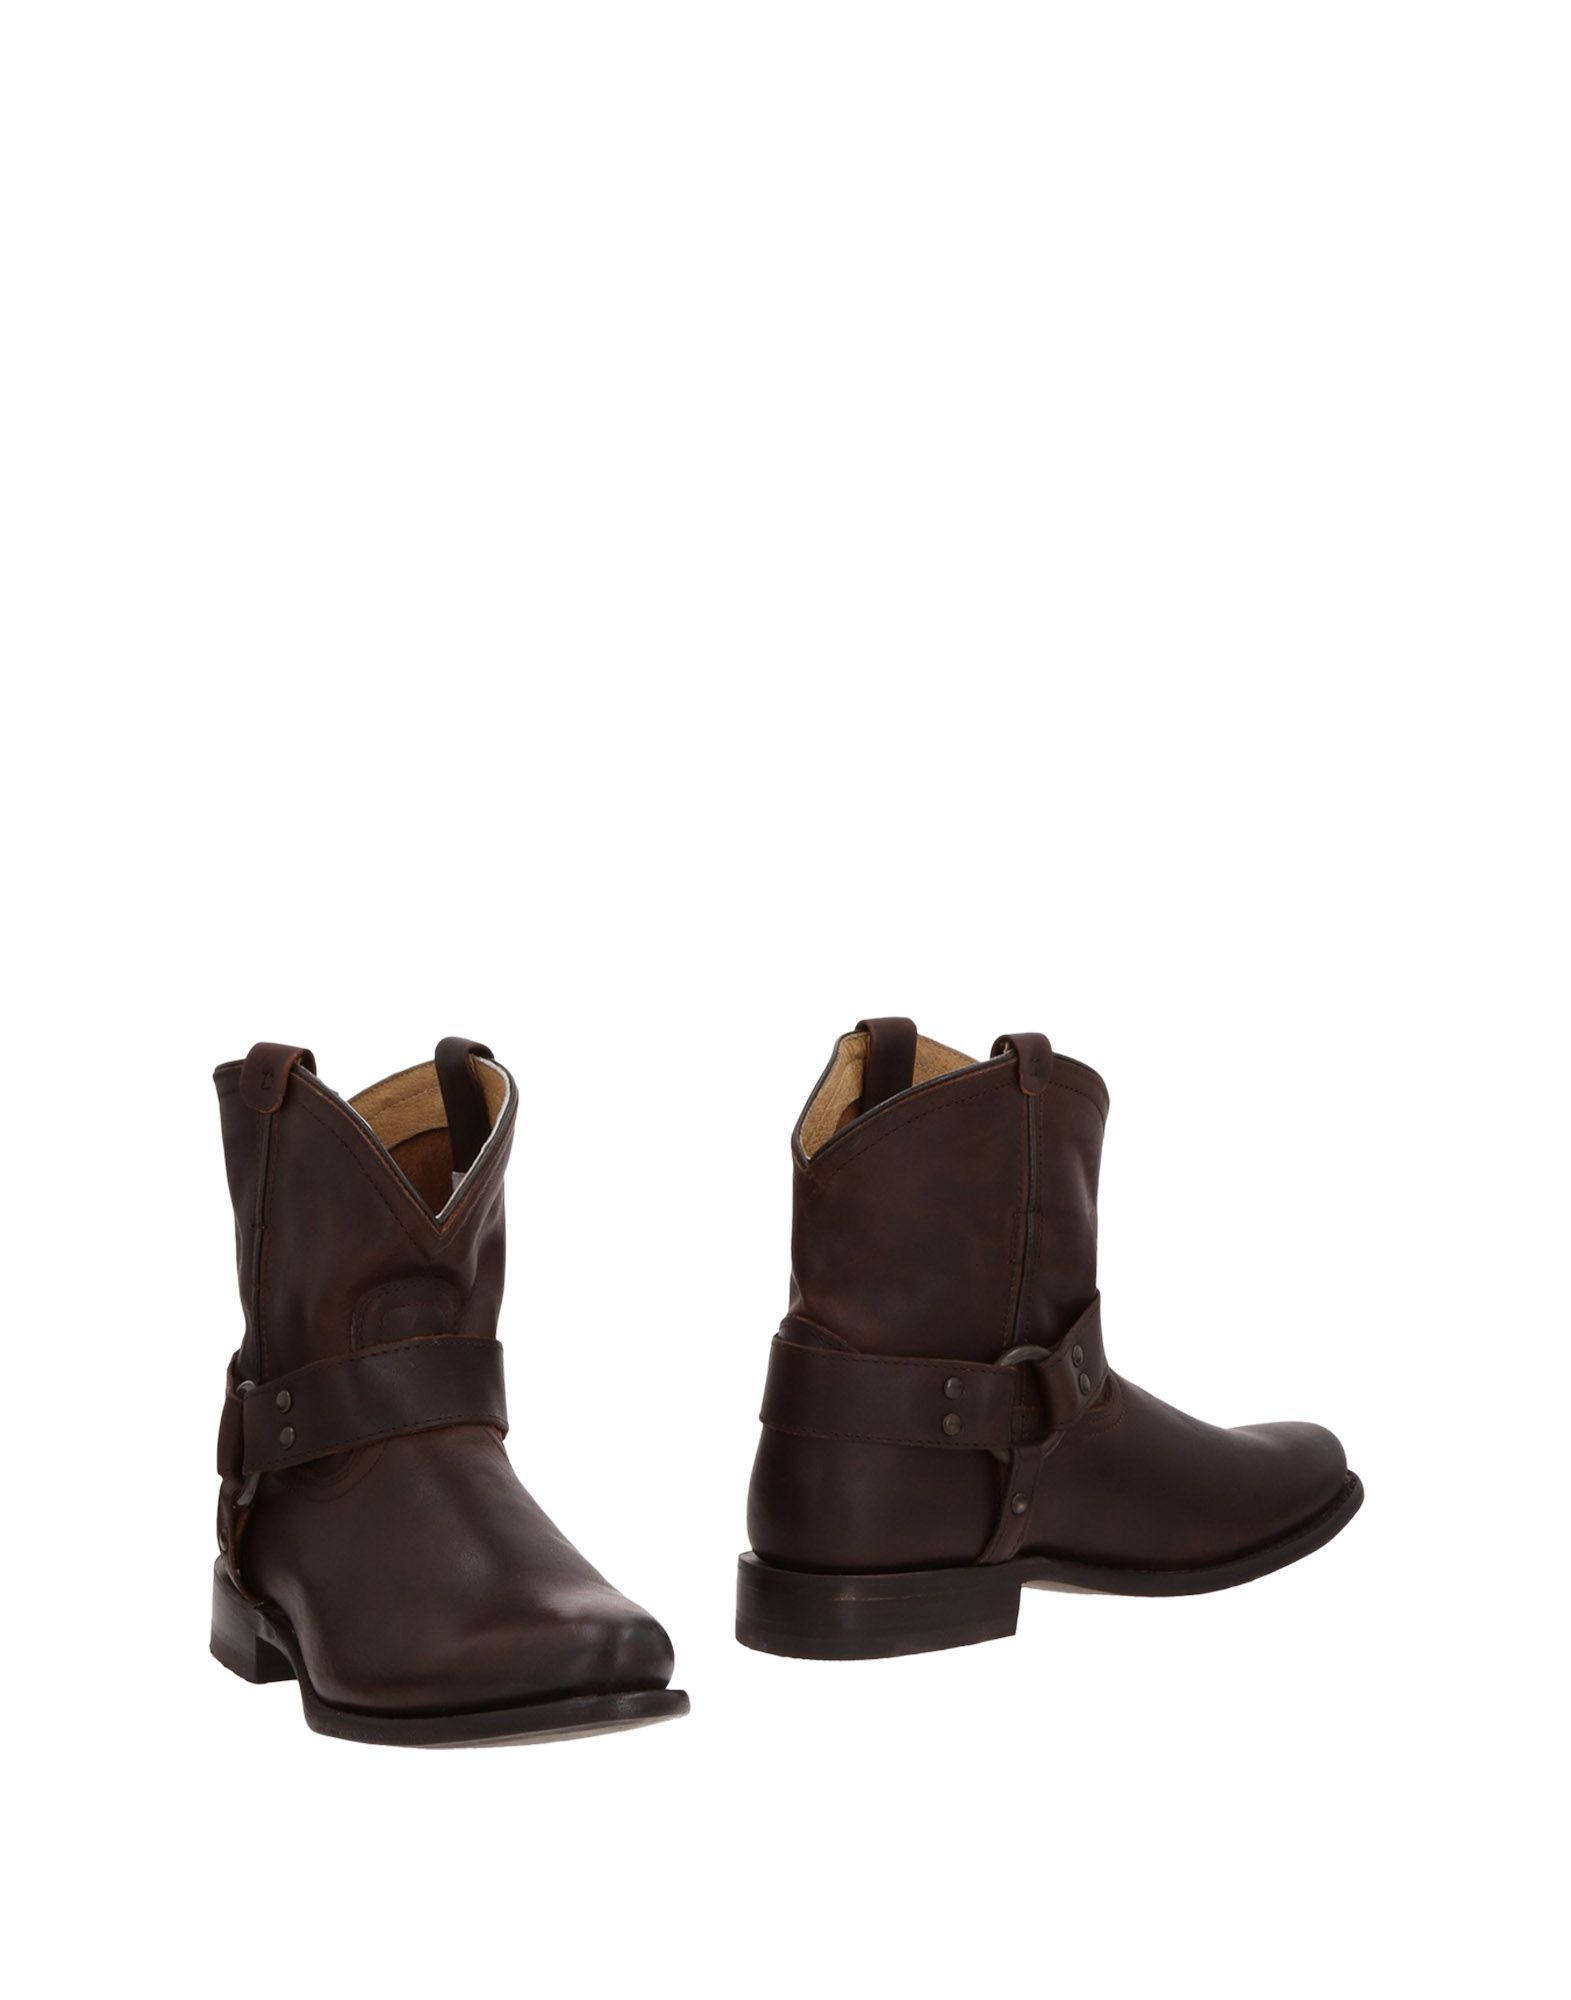 Frye Stiefelette Damen  11463882VT Heiße Schuhe Schuhe Schuhe eb3ea9